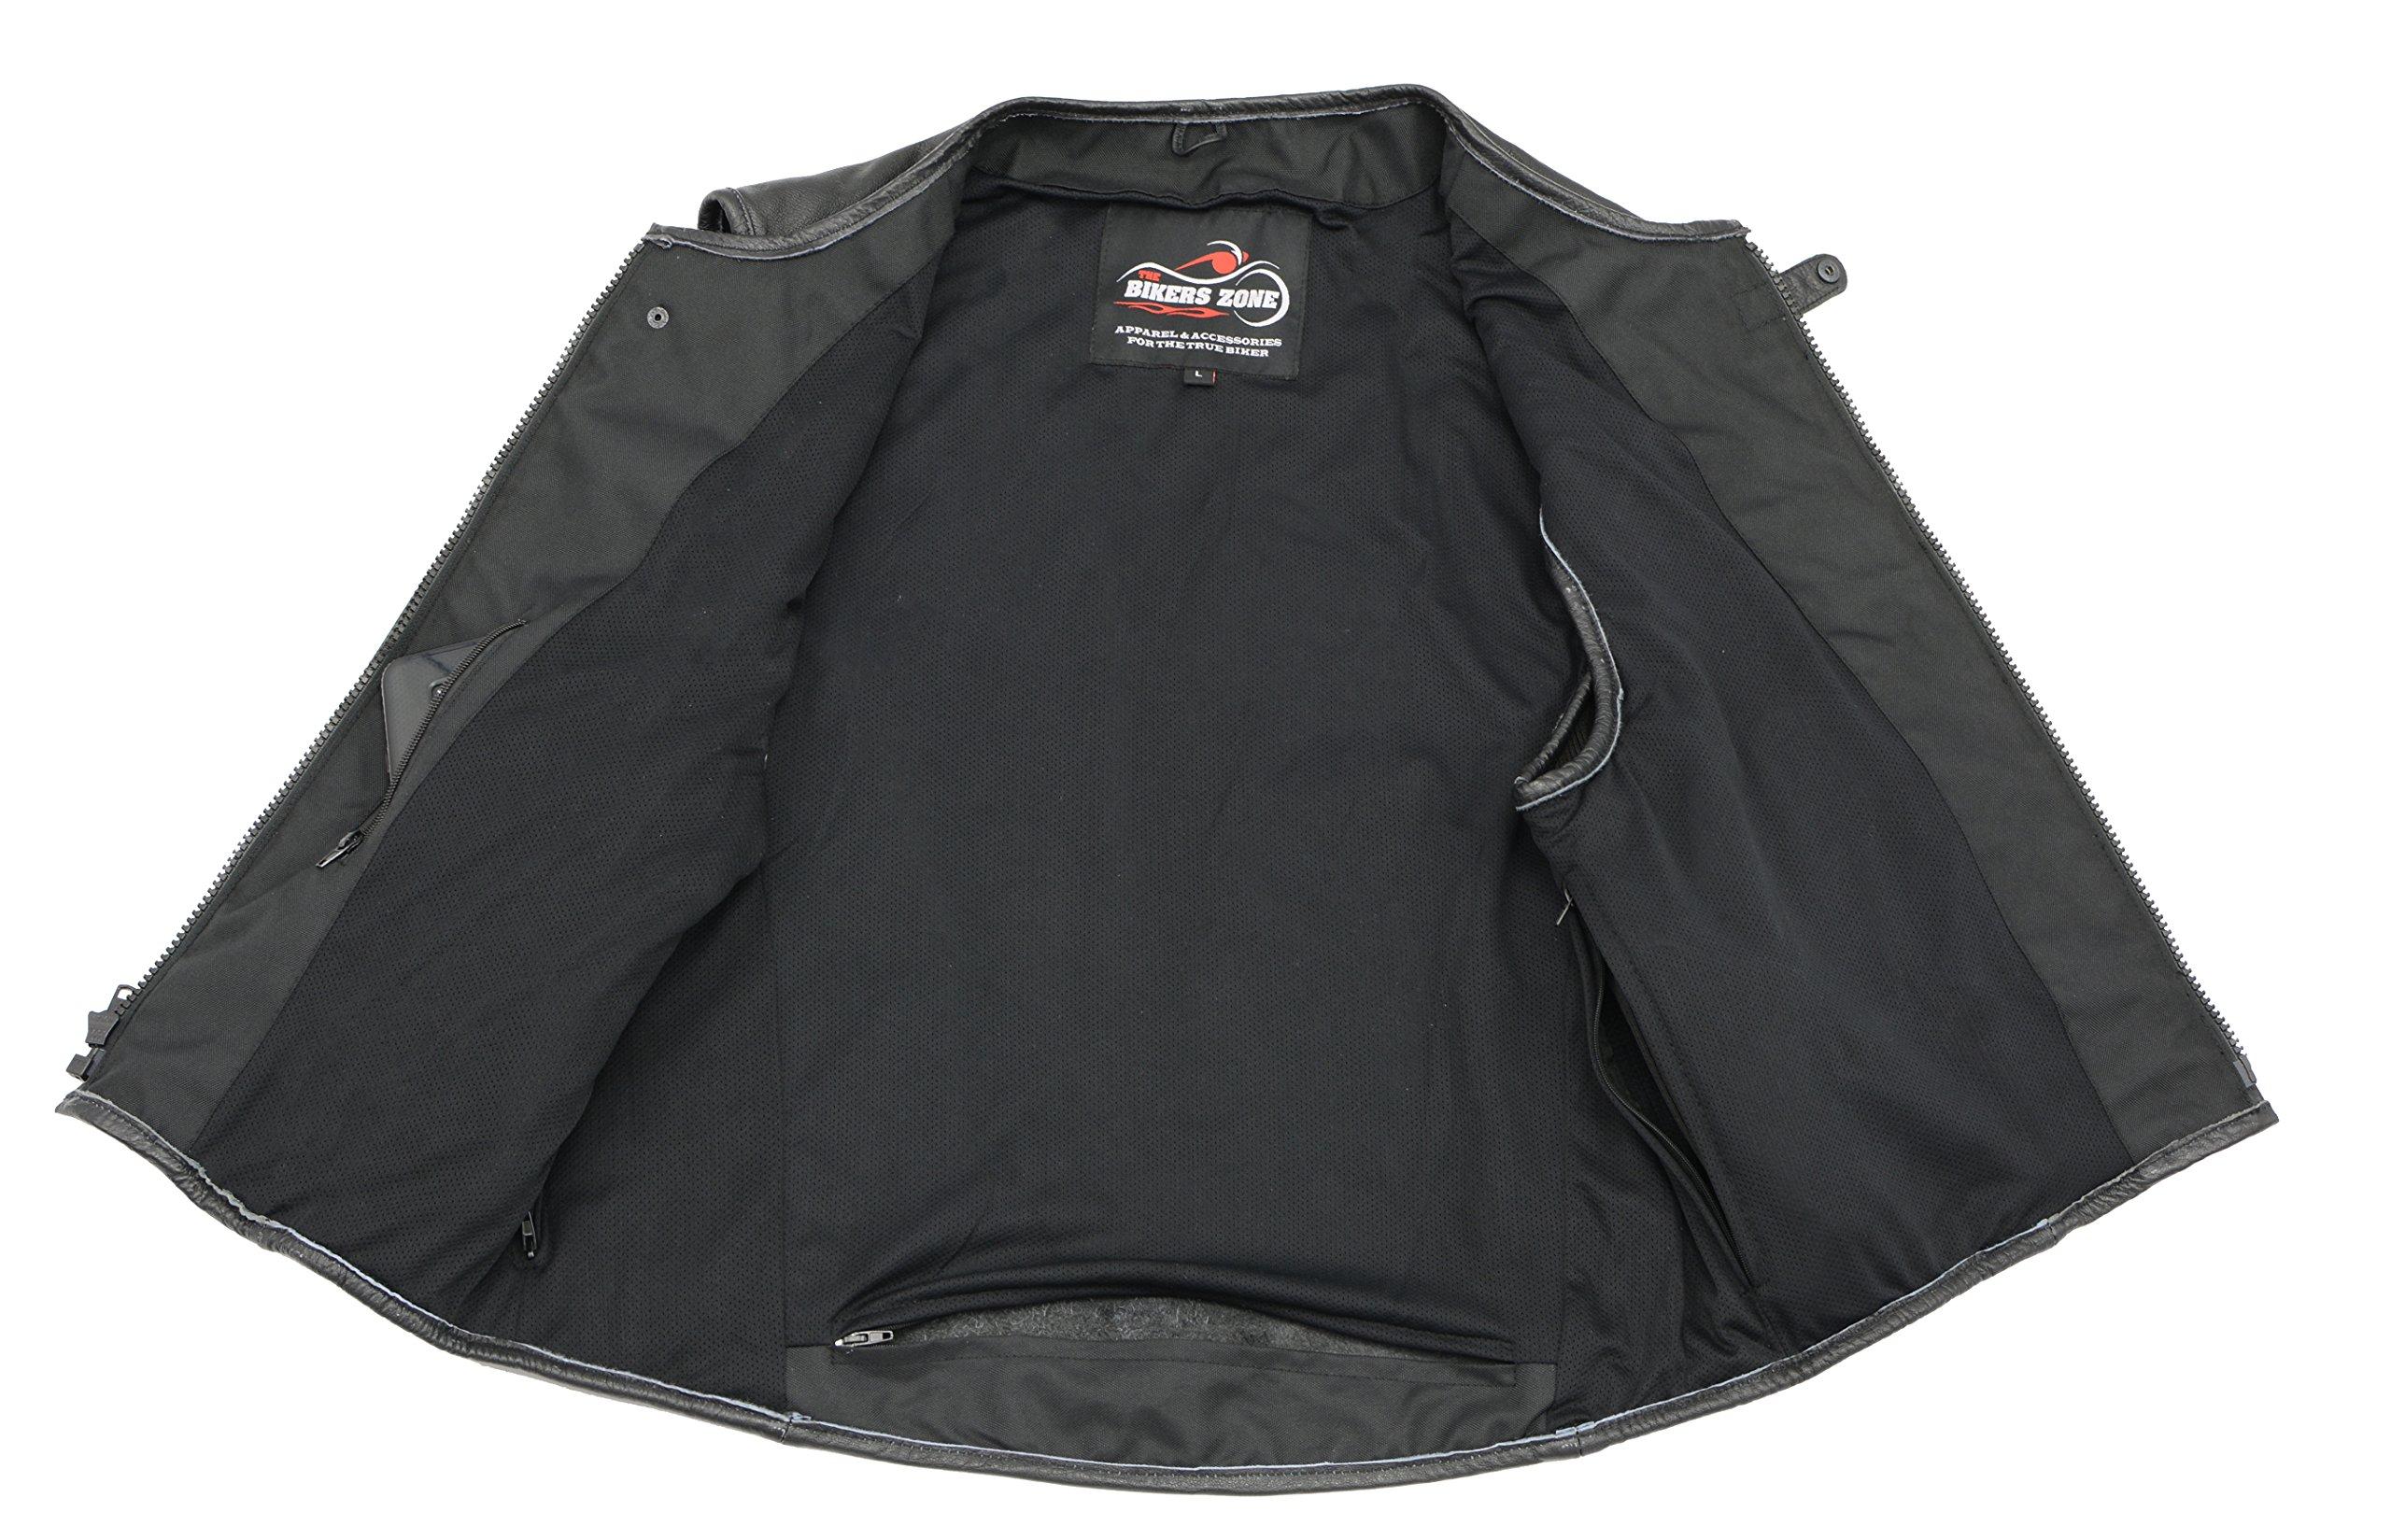 Men's Leather SWAT Style Vest | Premium Natural Buffalo Leather | Patch Access Lining, New Outseam Gun Pocket, Adjustable Side Straps, Zipper Front Closure | Black Biker Vest (Black, 3X-Large) by The Bikers Zone (Image #4)